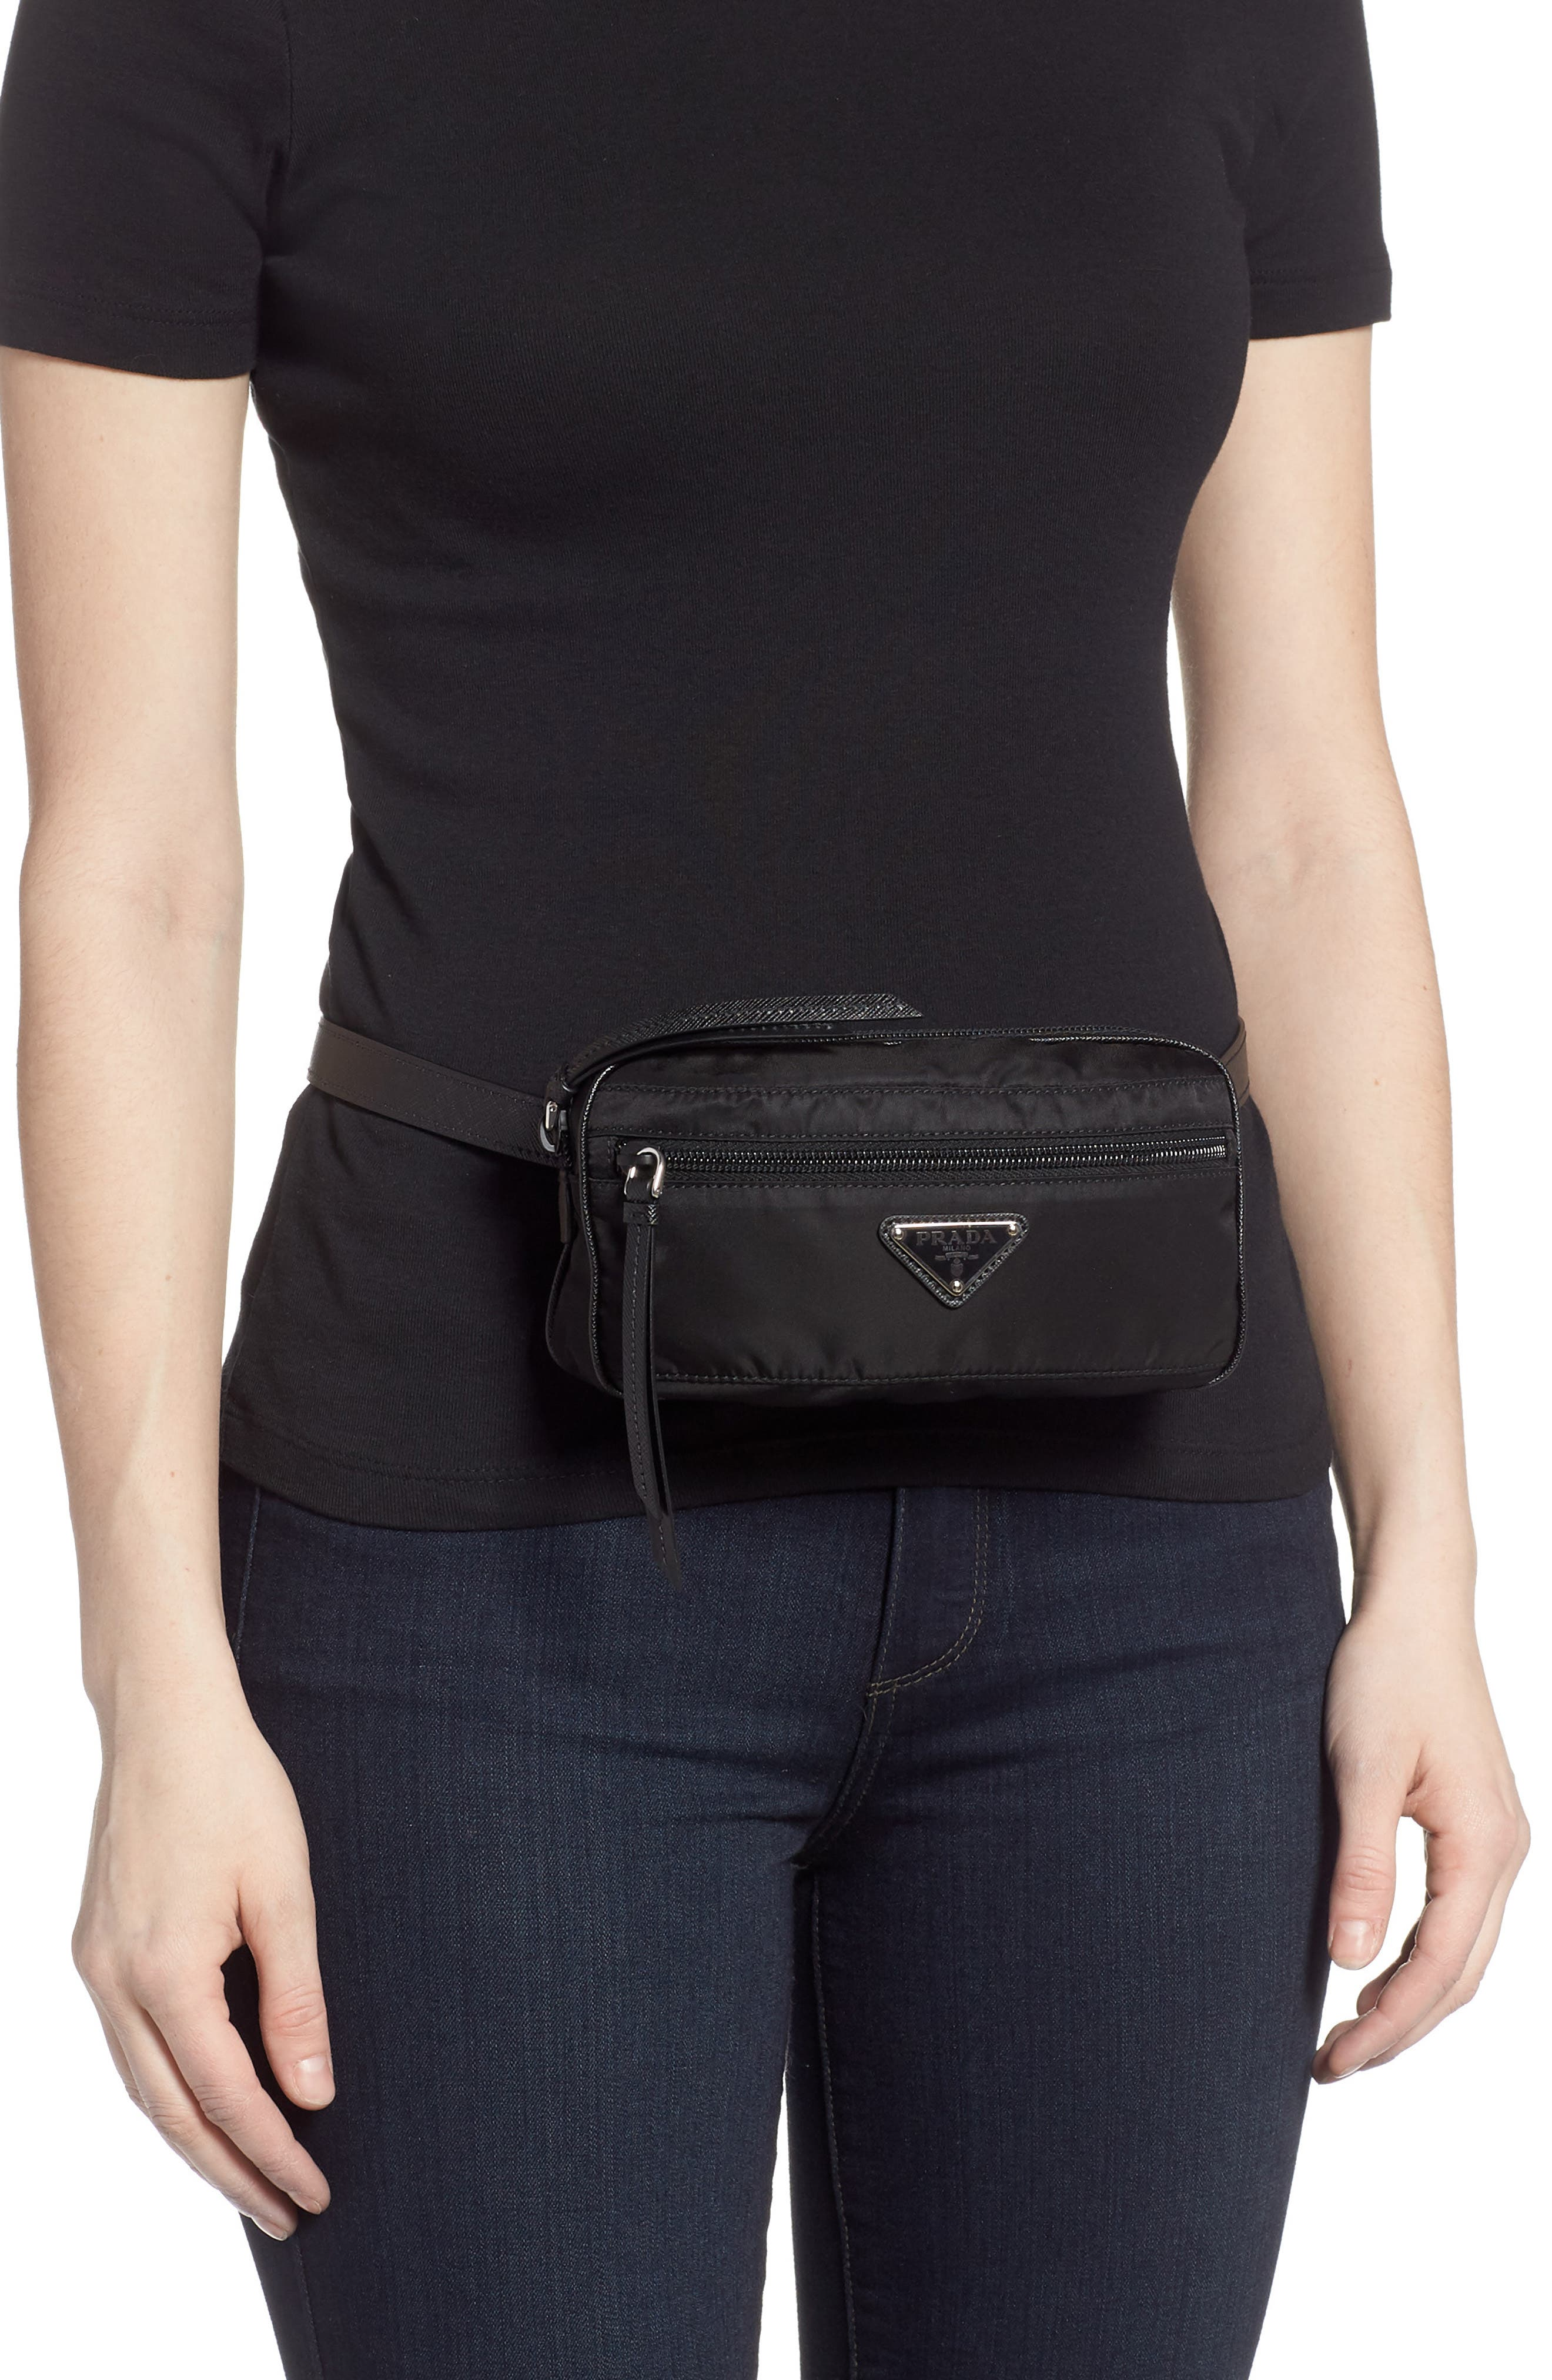 PRADA,                             Small Nylon Belt Bag,                             Alternate thumbnail 2, color,                             NERO